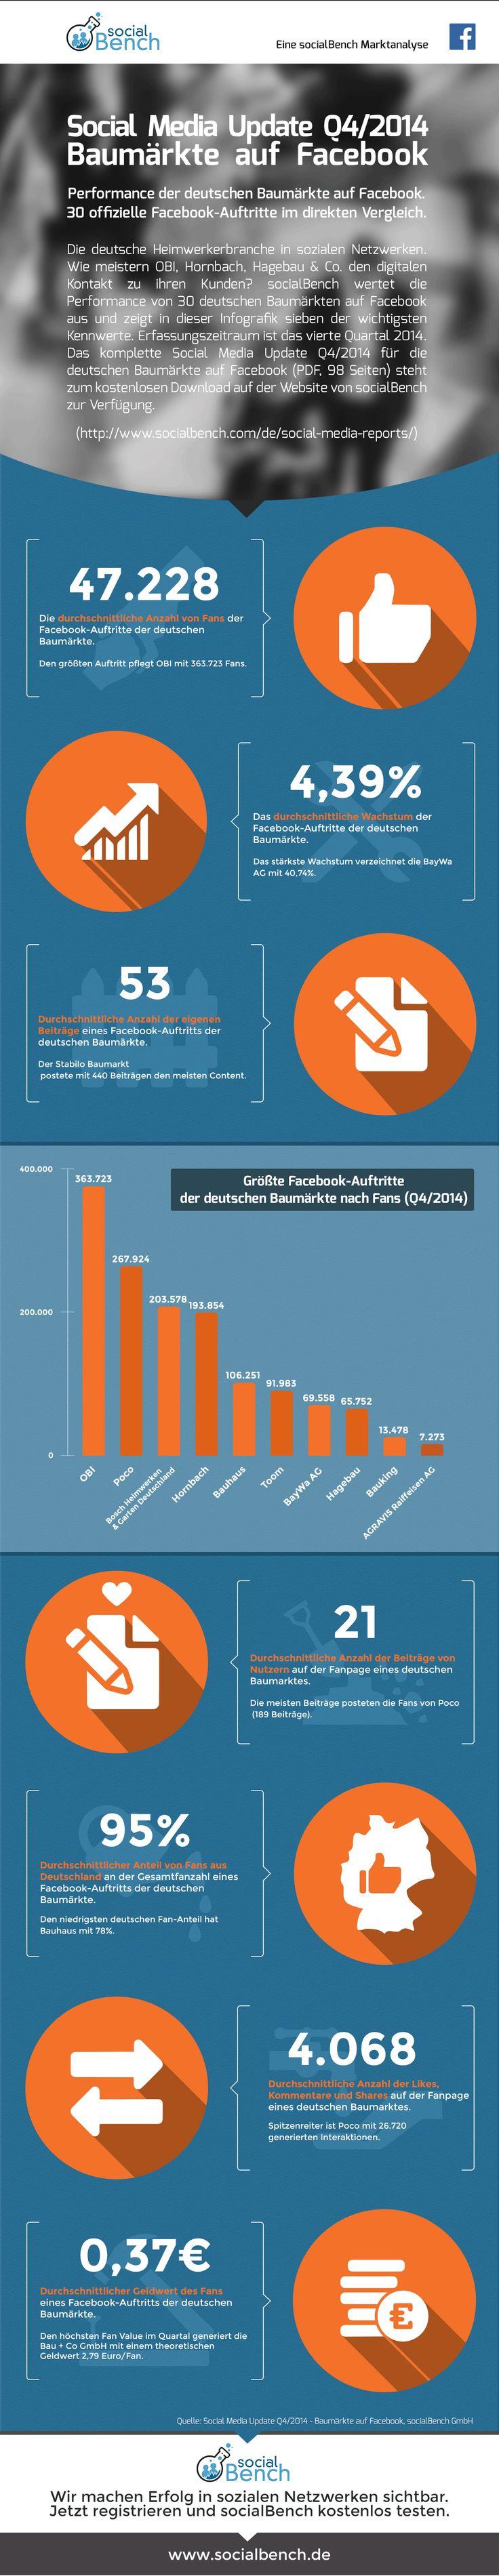 Infografik: Social Media Update Q4/2014 - deutsche Baumärkte auf Facebook http://www.socialbench.com/de/report/baumaerkte/q42014/